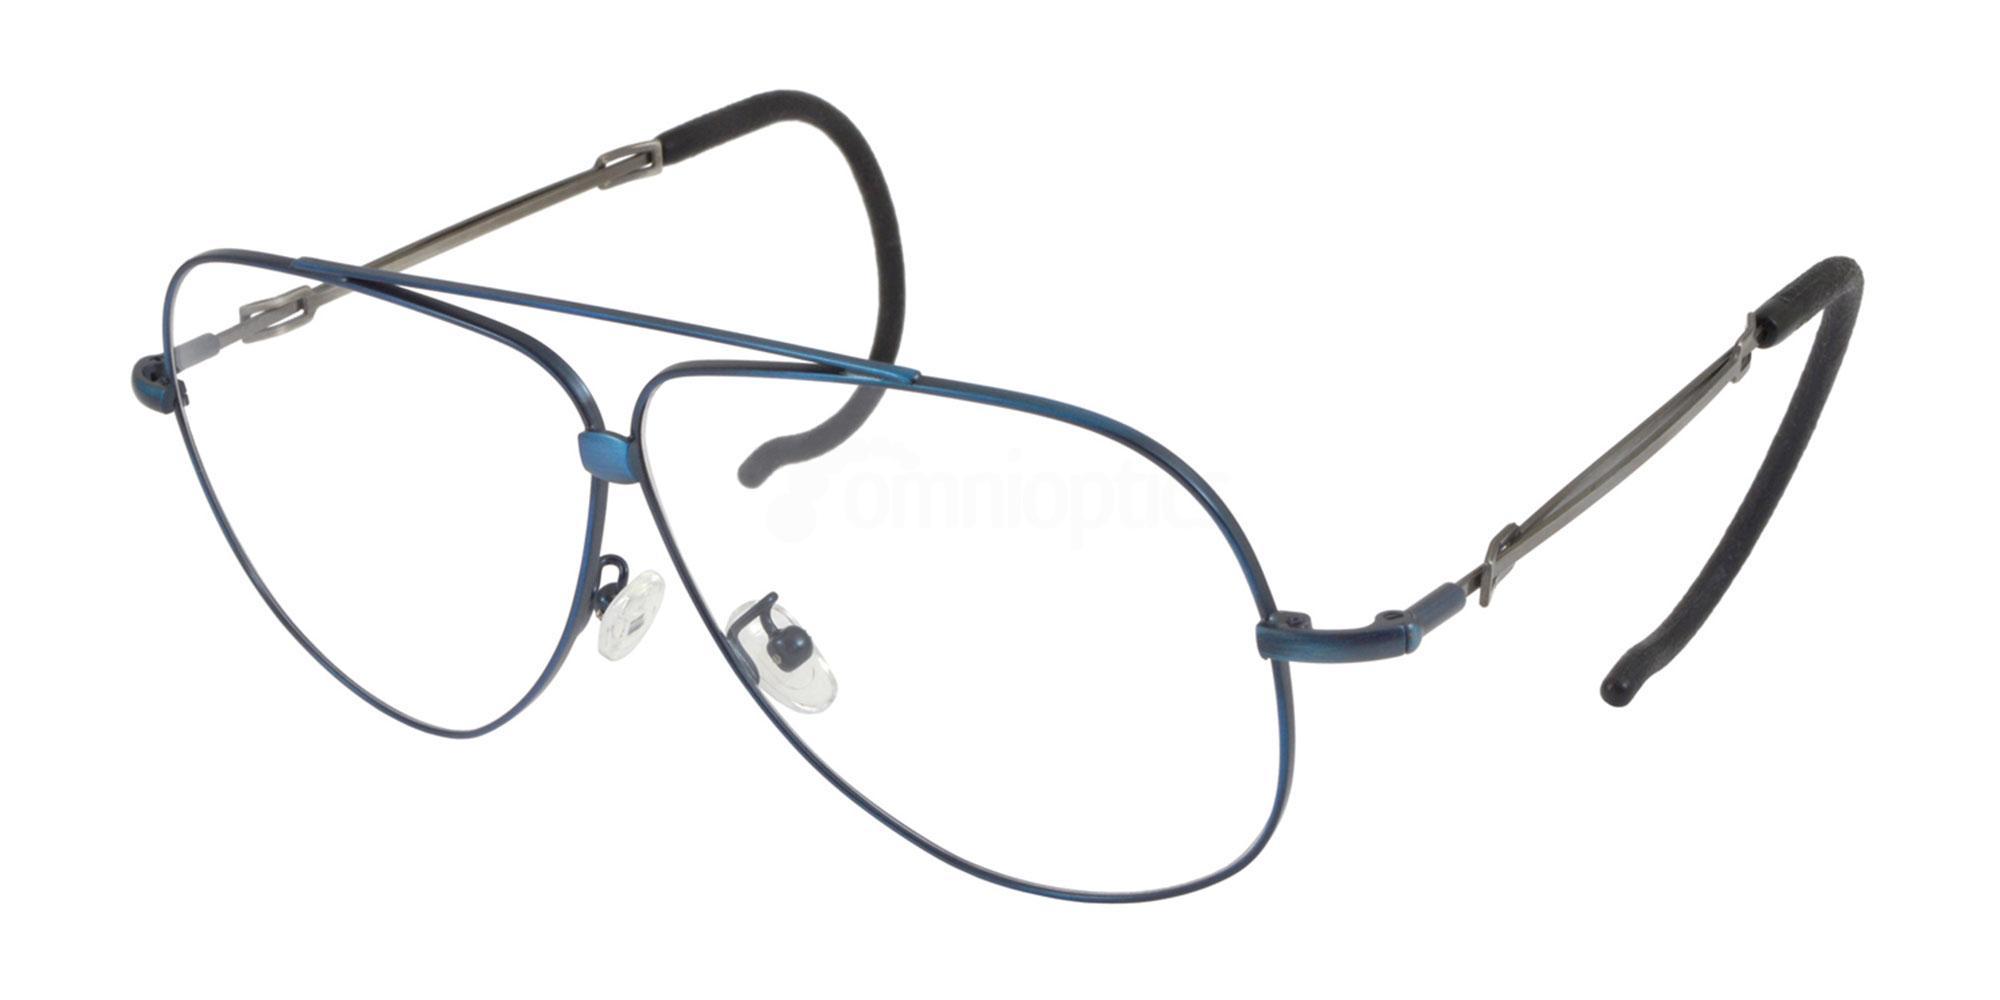 Blue Winner Colt 2 Accessories, Sports Eyewear